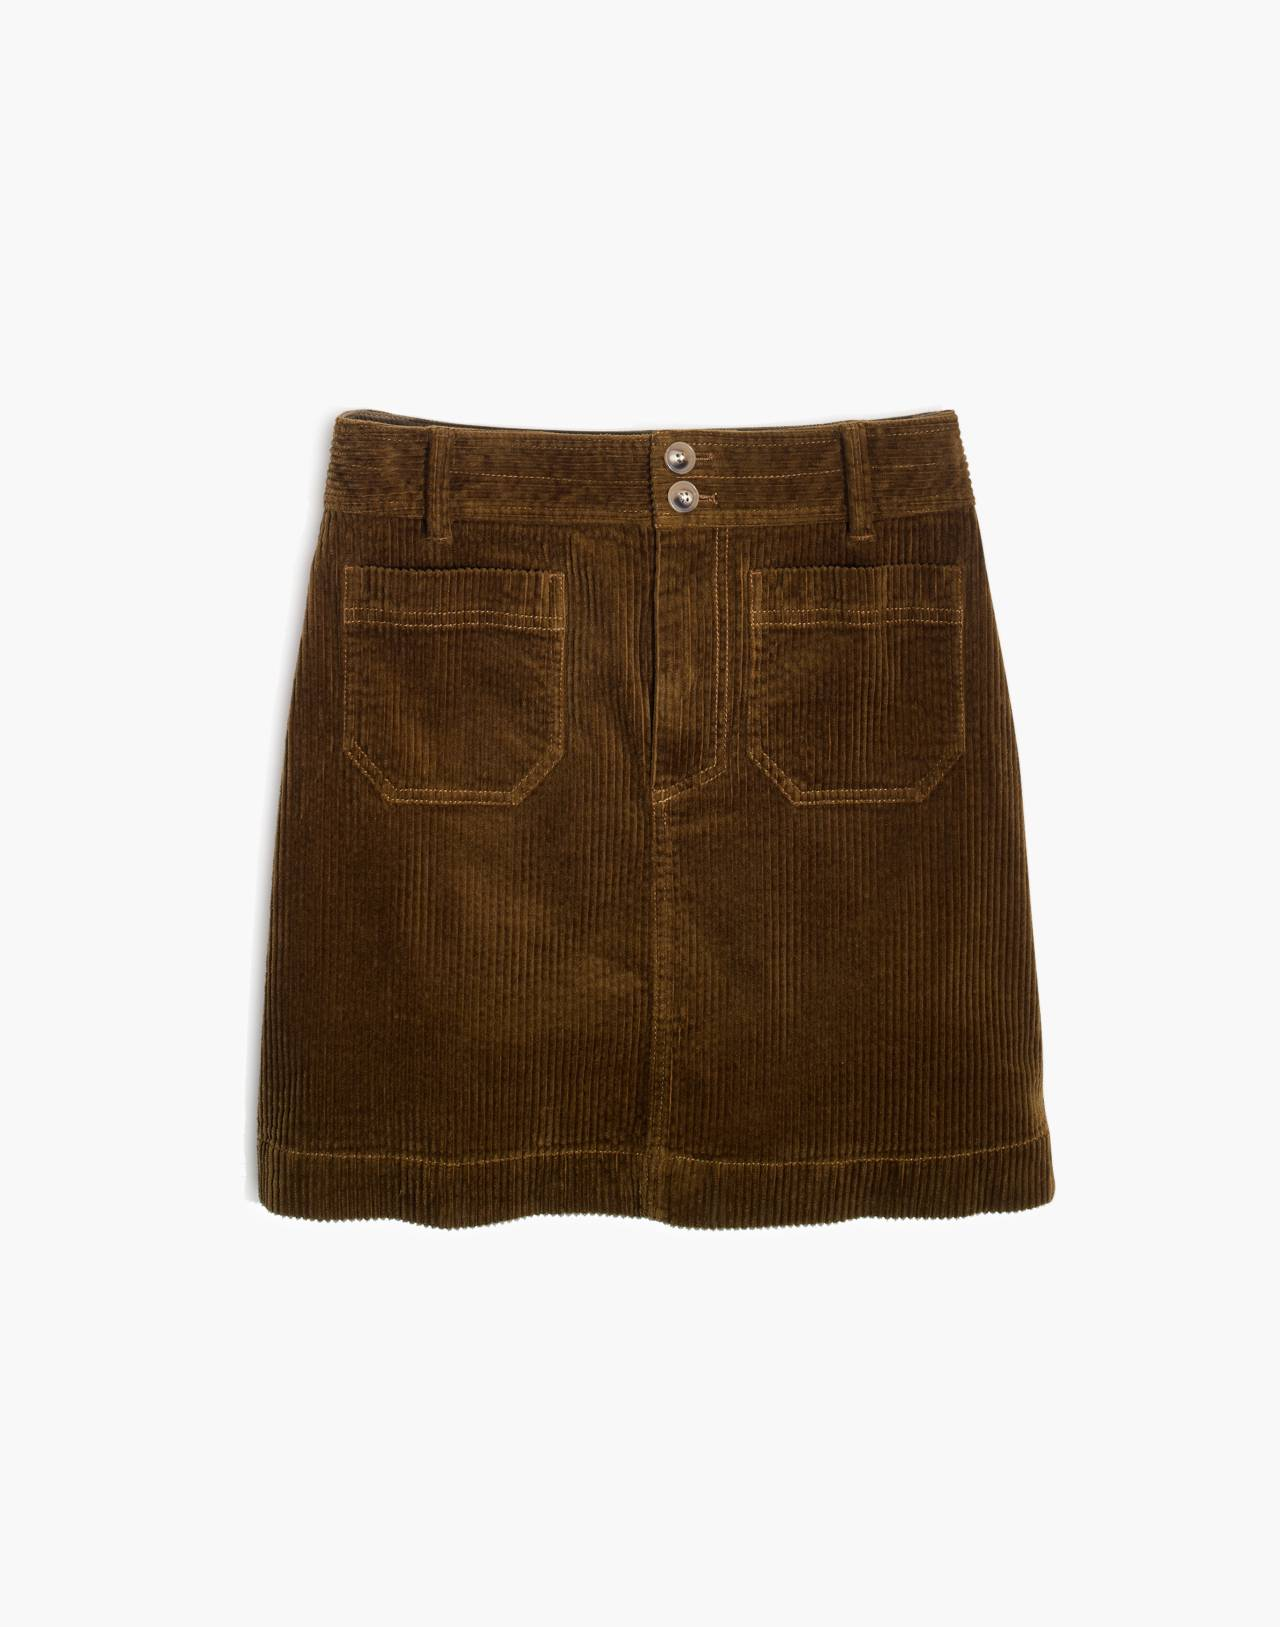 Corduroy A-Line Mini Skirt in asparagus image 4